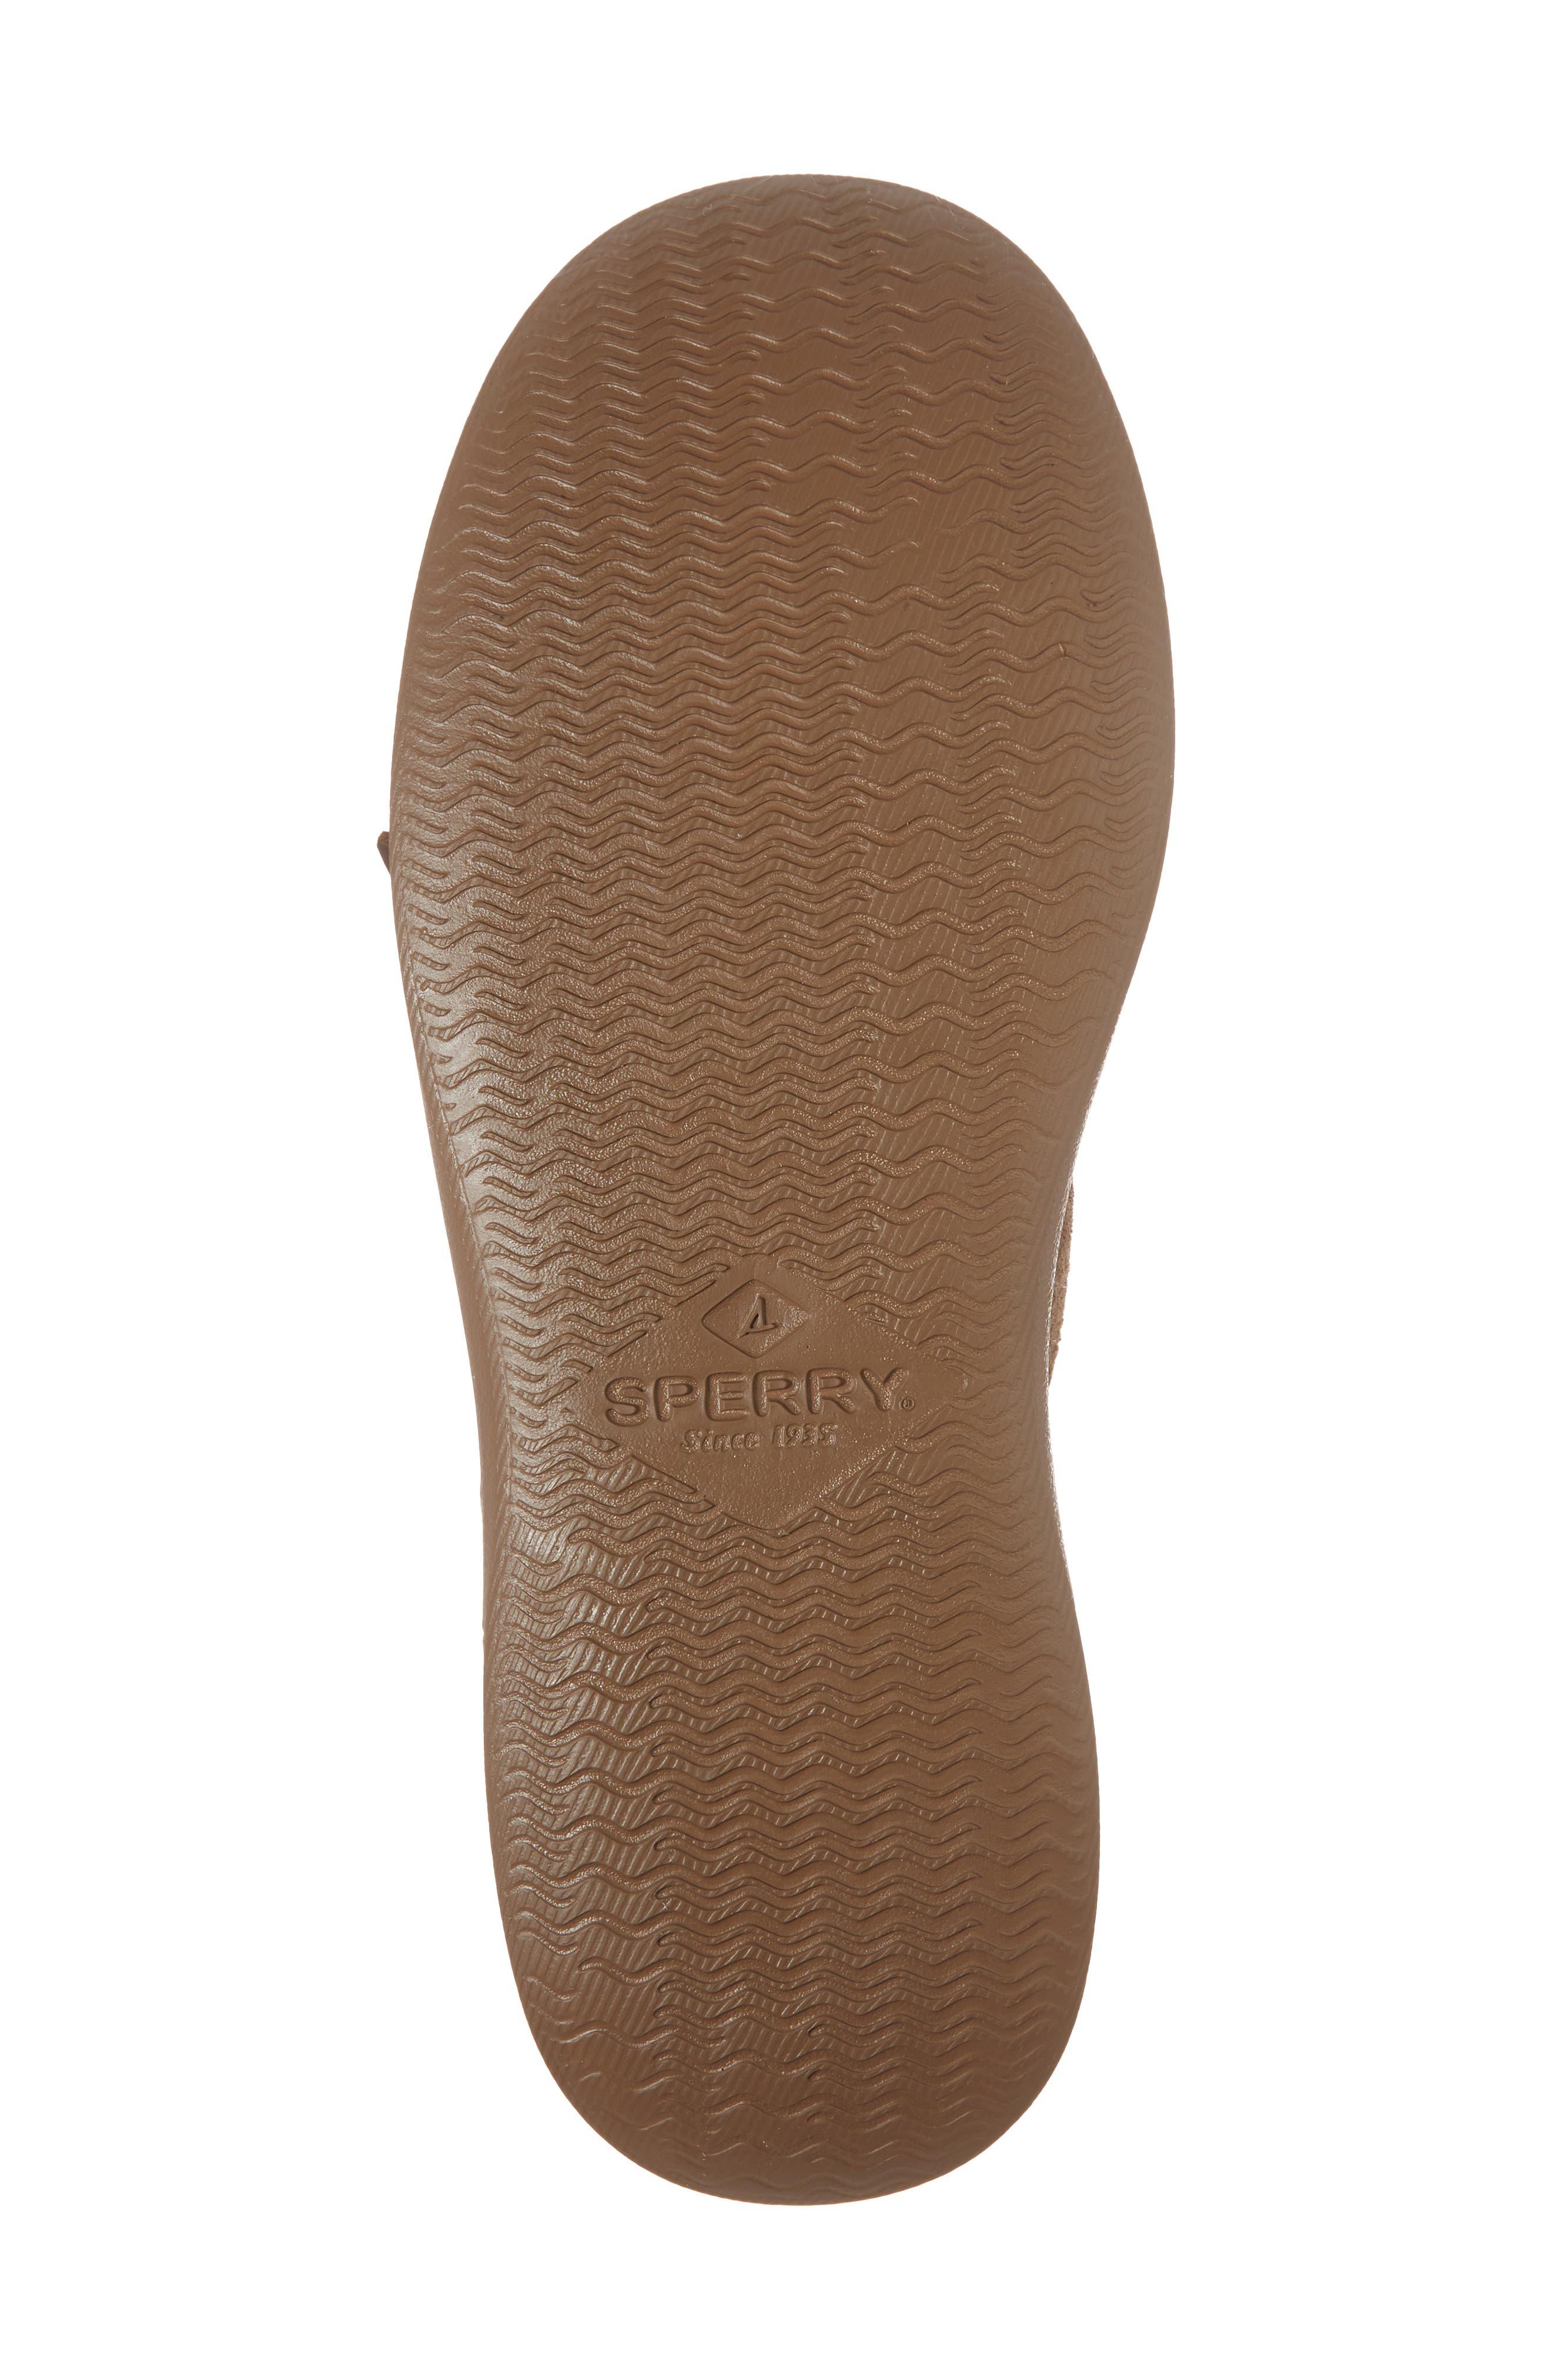 Caspian Boat Shoe,                             Alternate thumbnail 6, color,                             Tan Leather/ Suede